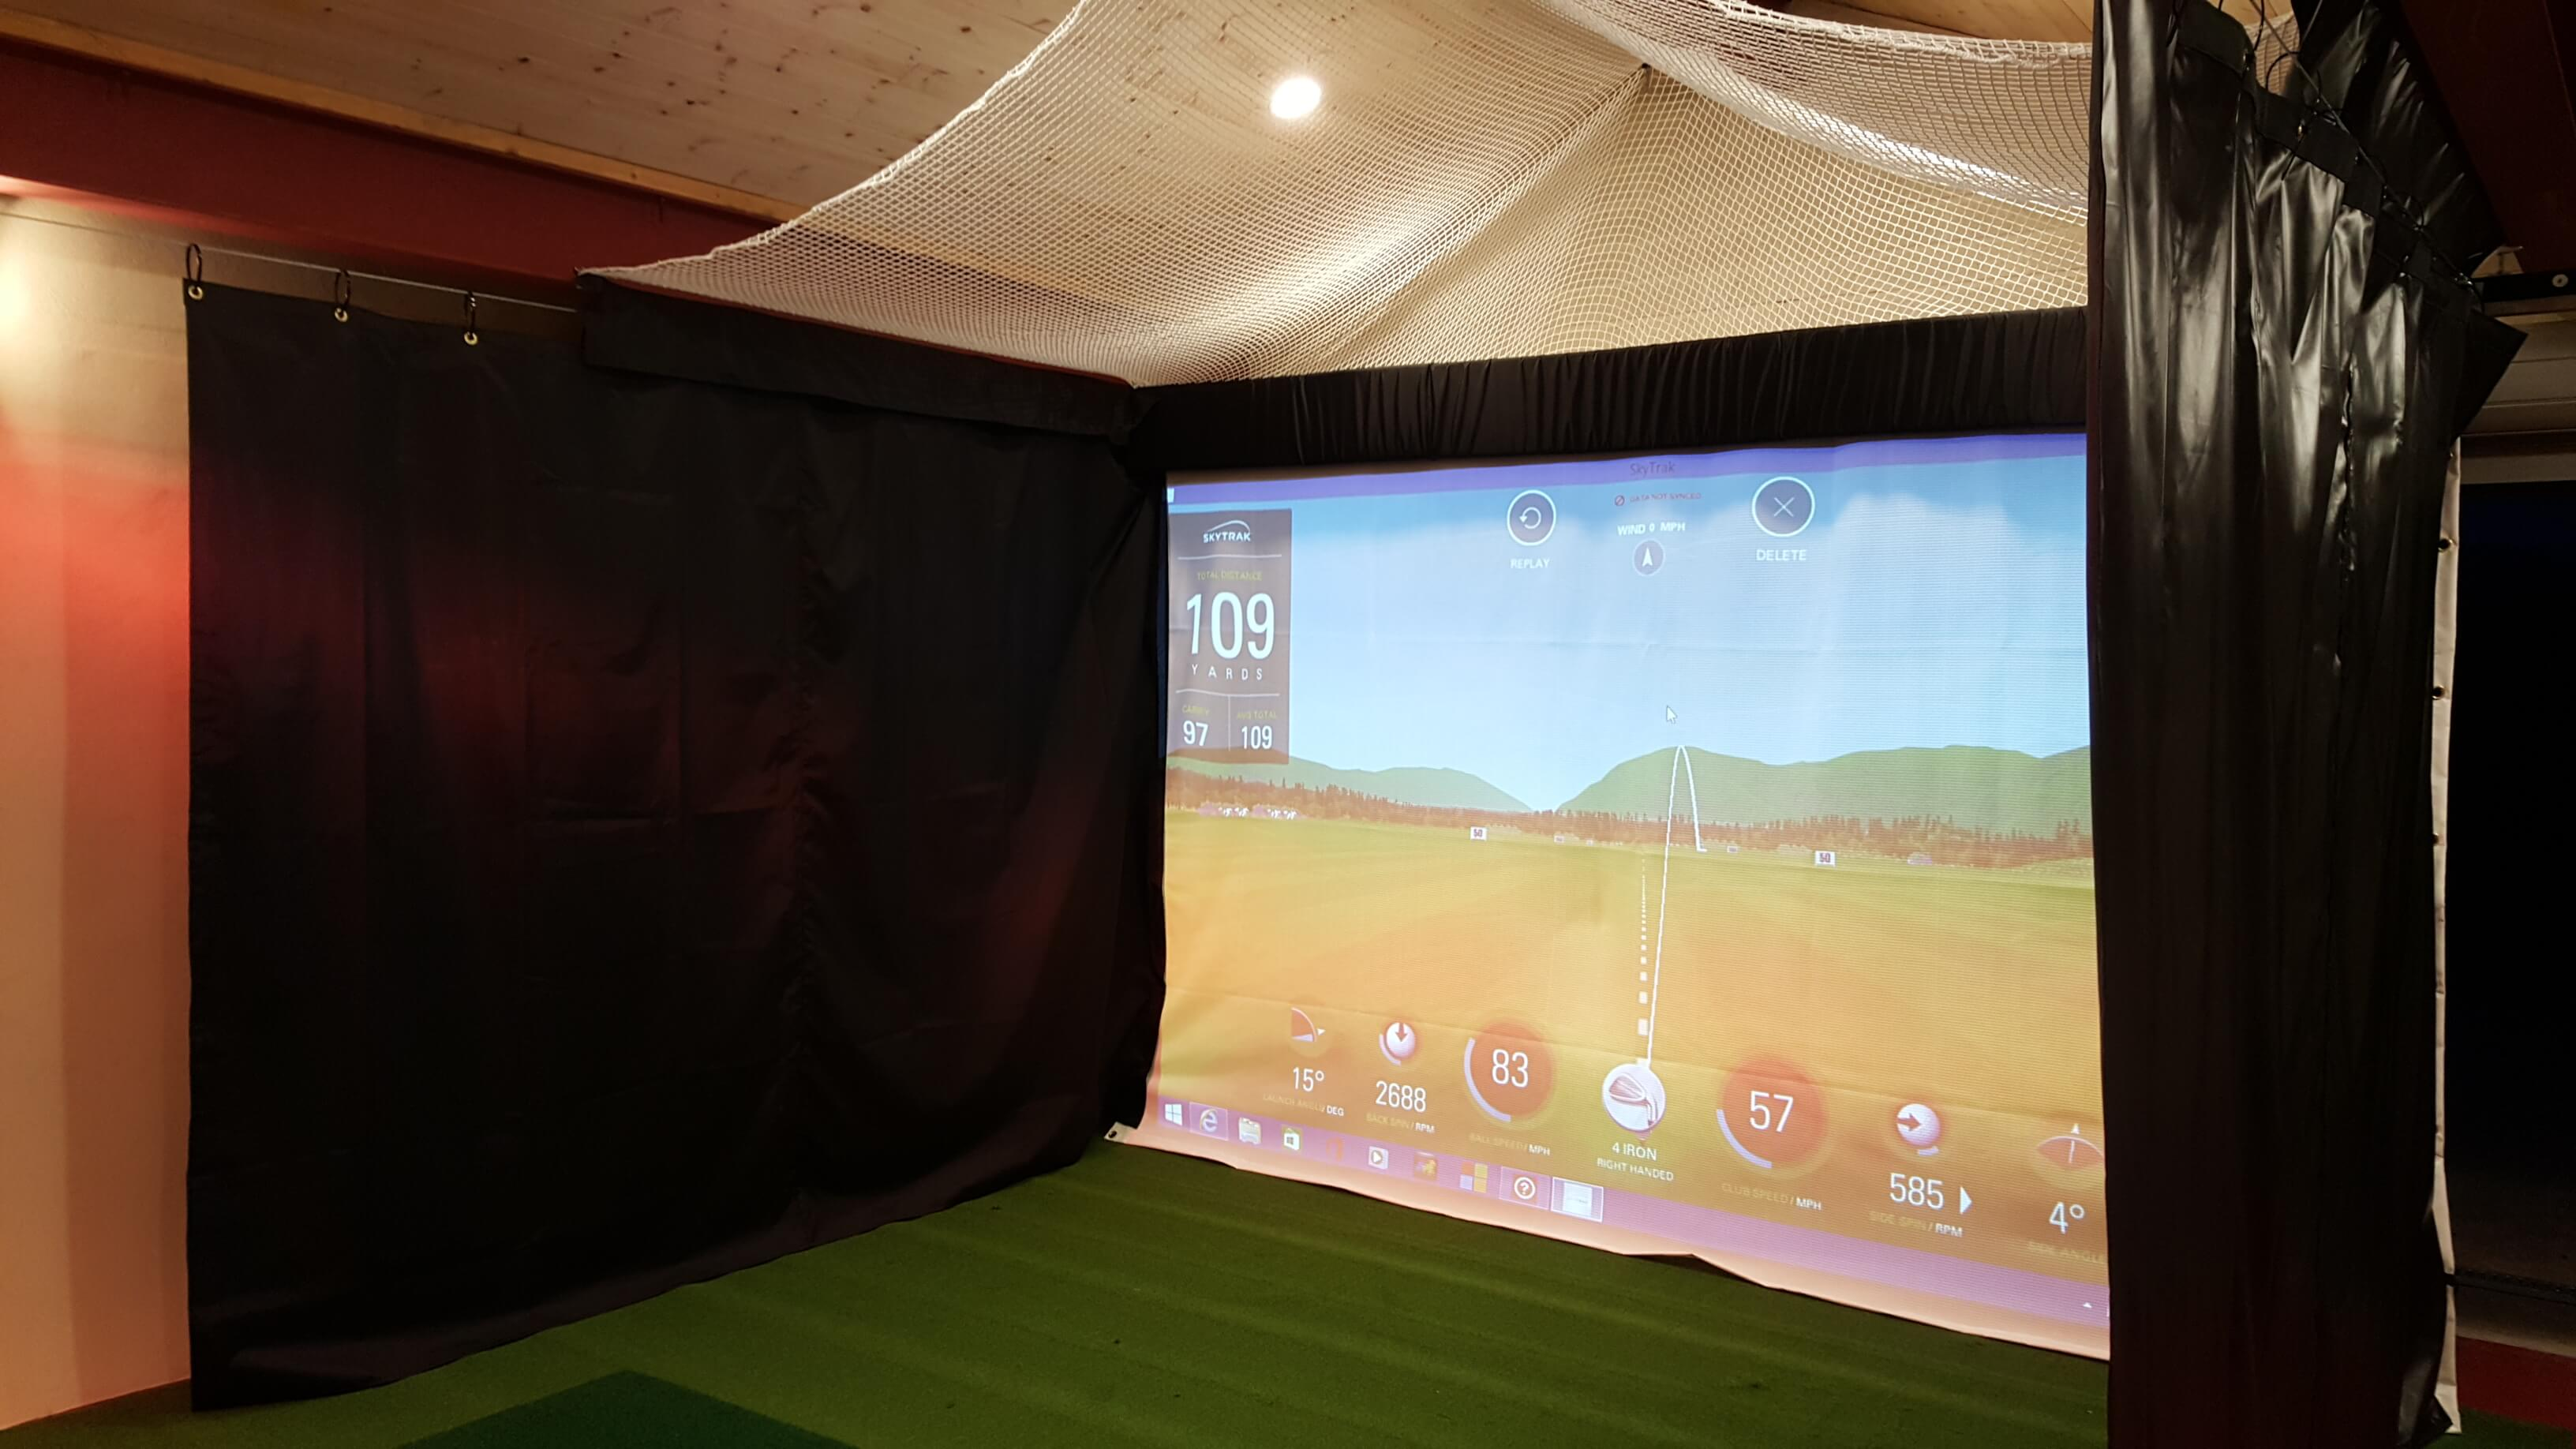 Indoor Home Garage Golf Simulator In Windermere Golf